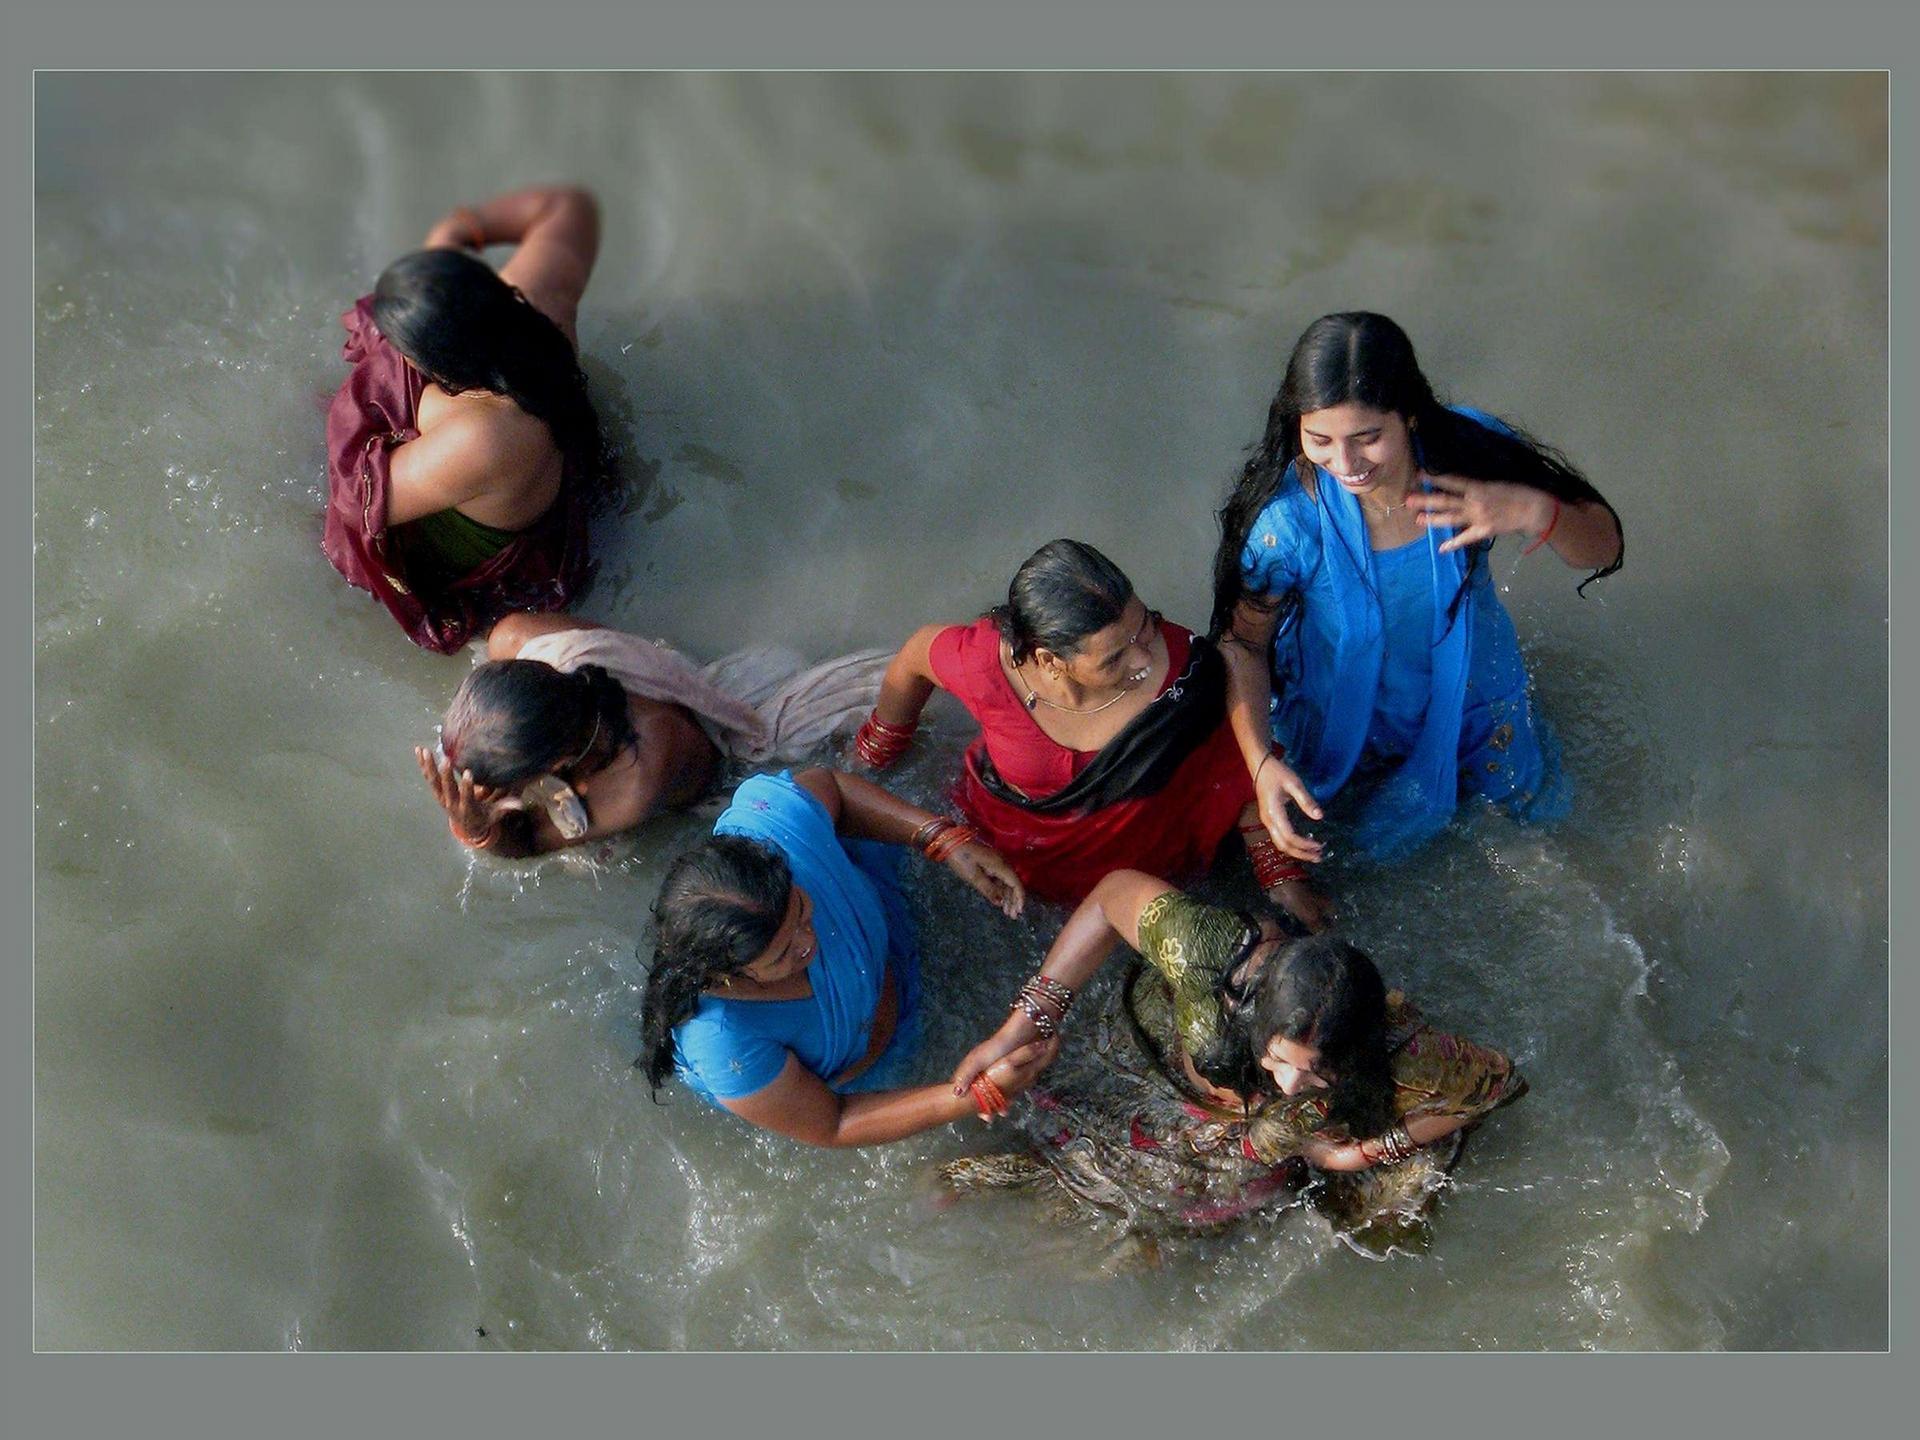 Photograph by Shyamal Roy